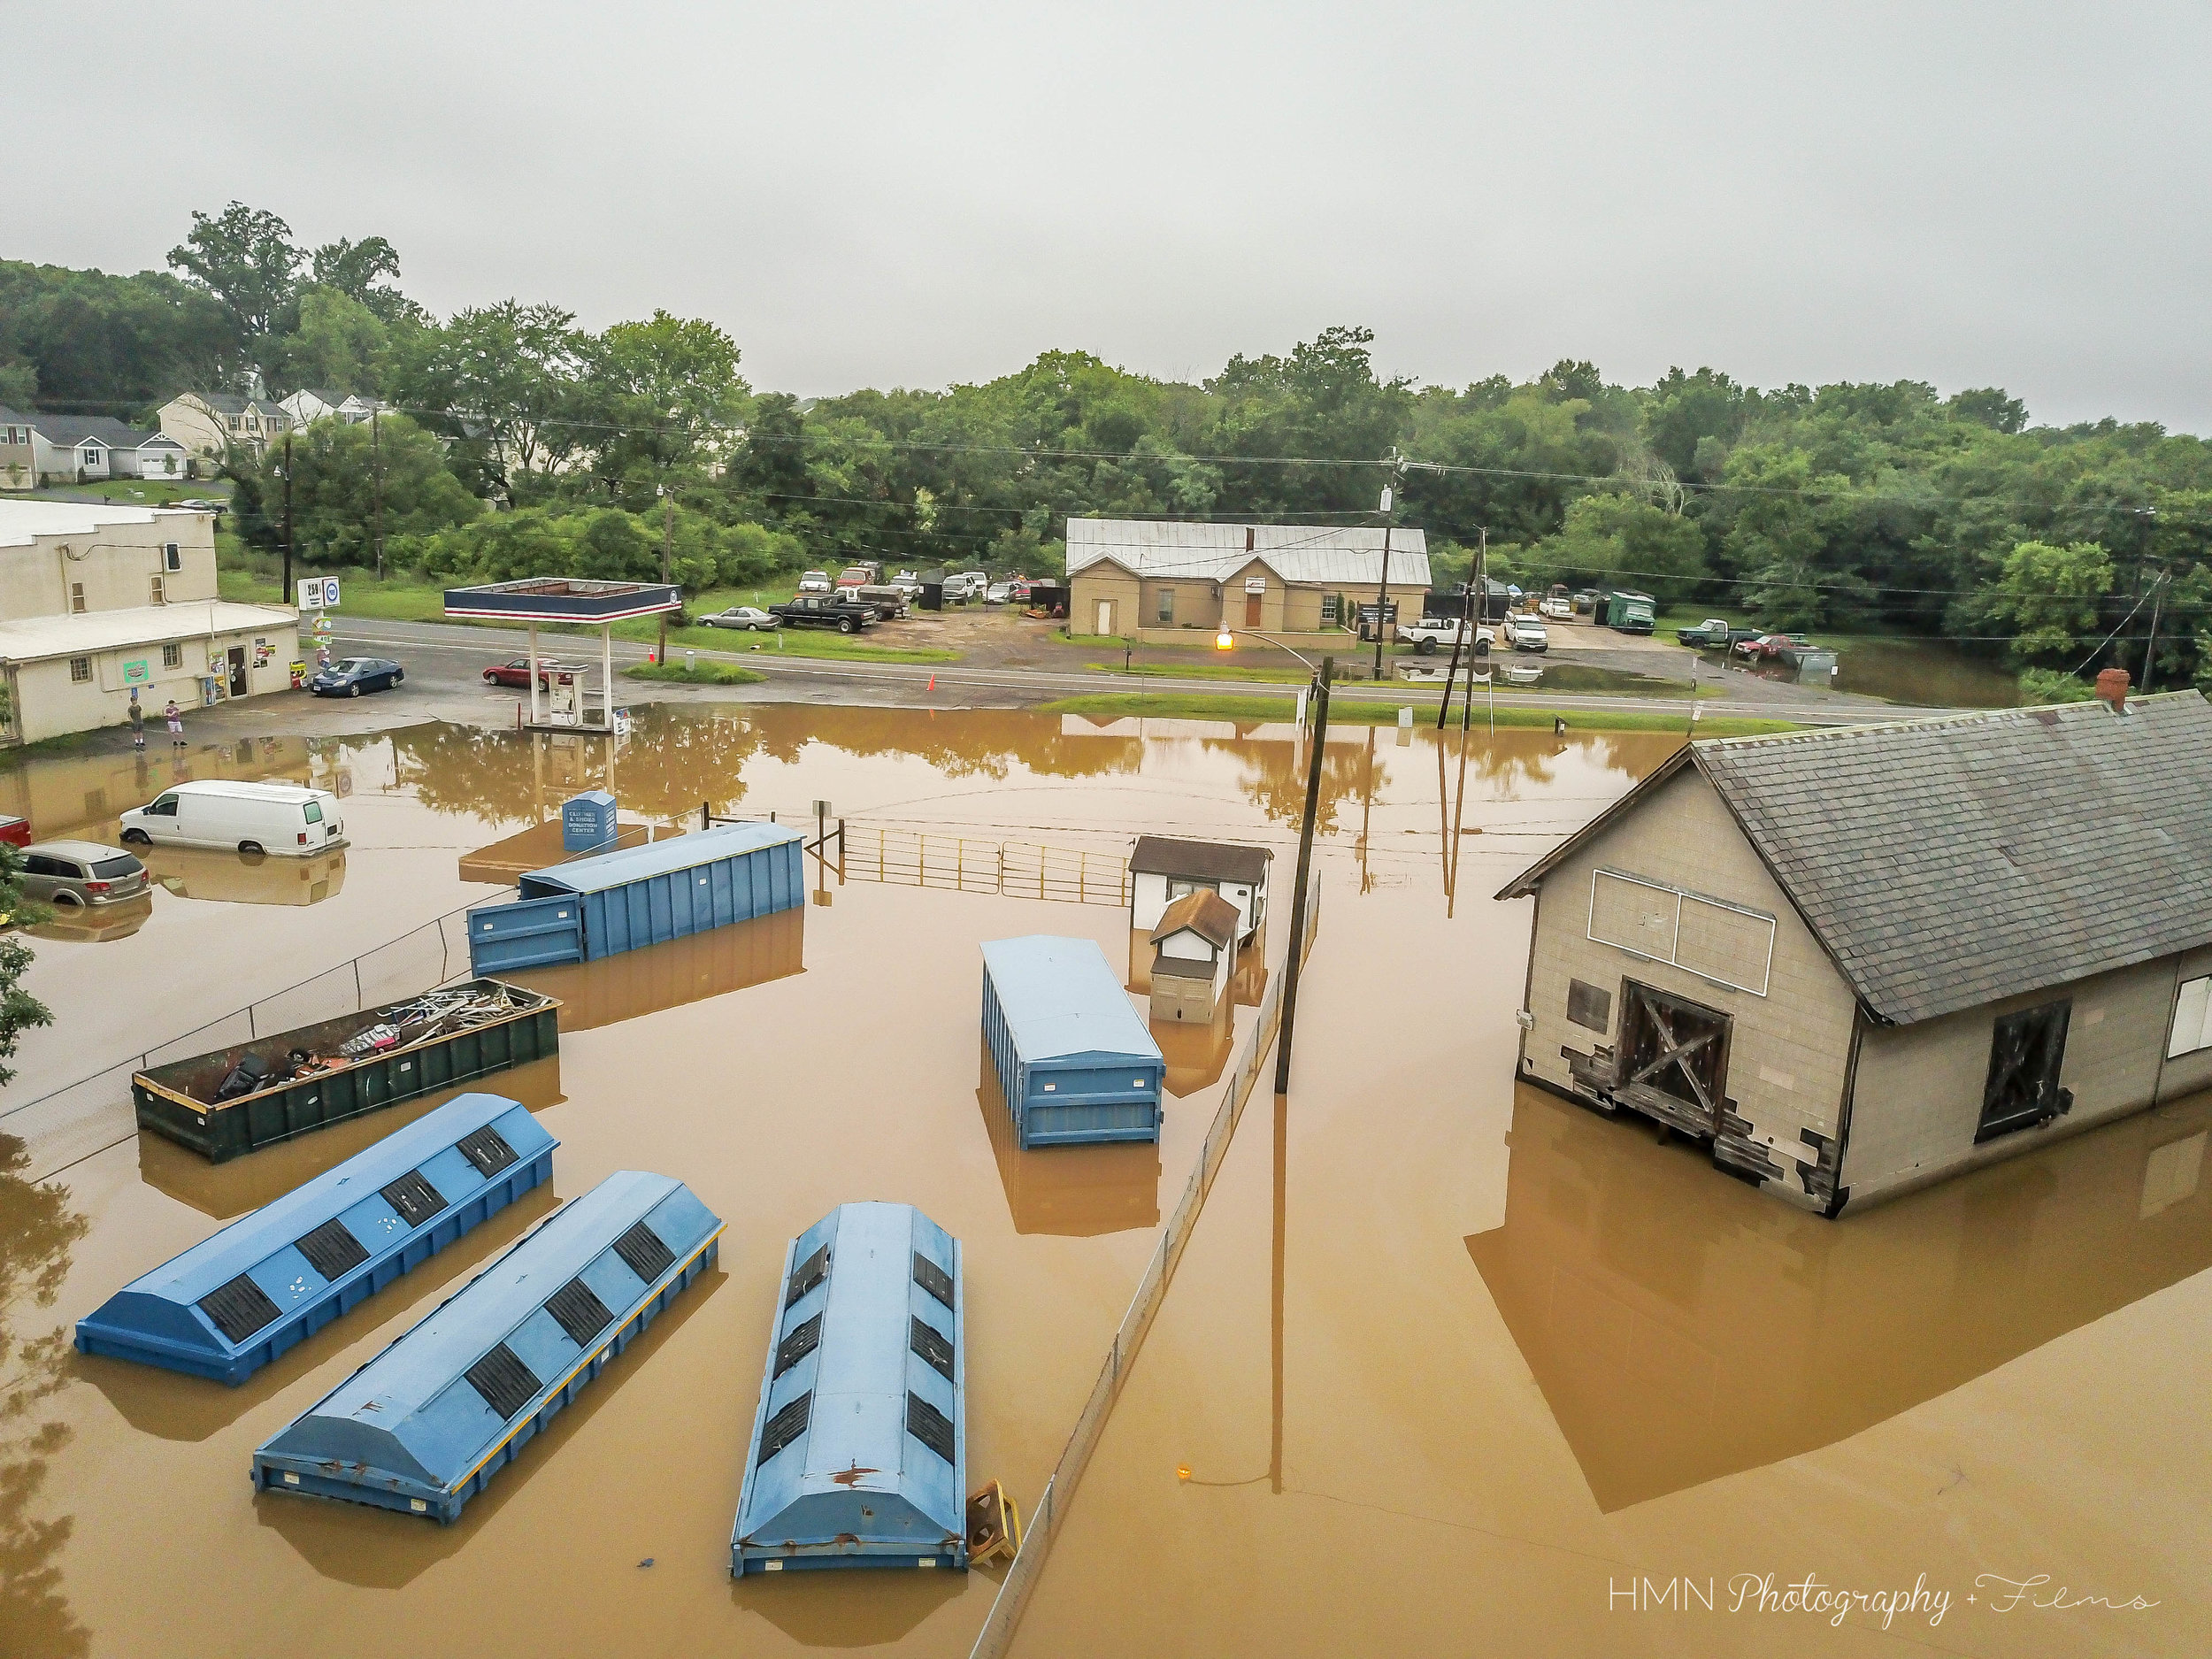 Remington Flooding Aerial Photography